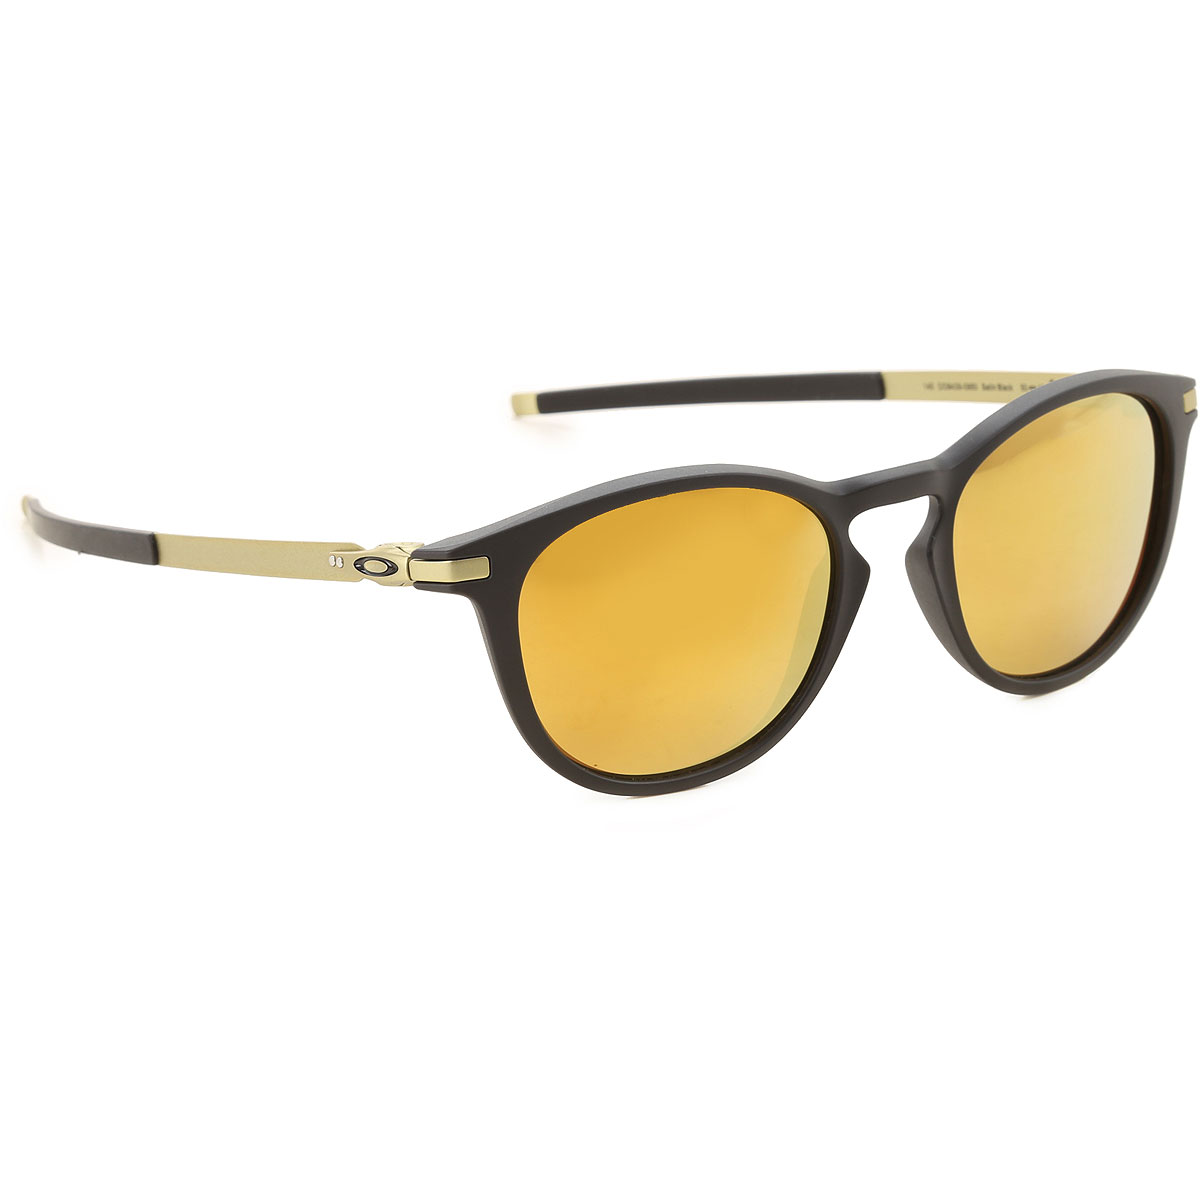 Oakley Sunglasses On Sale, Matt Gold, 2019